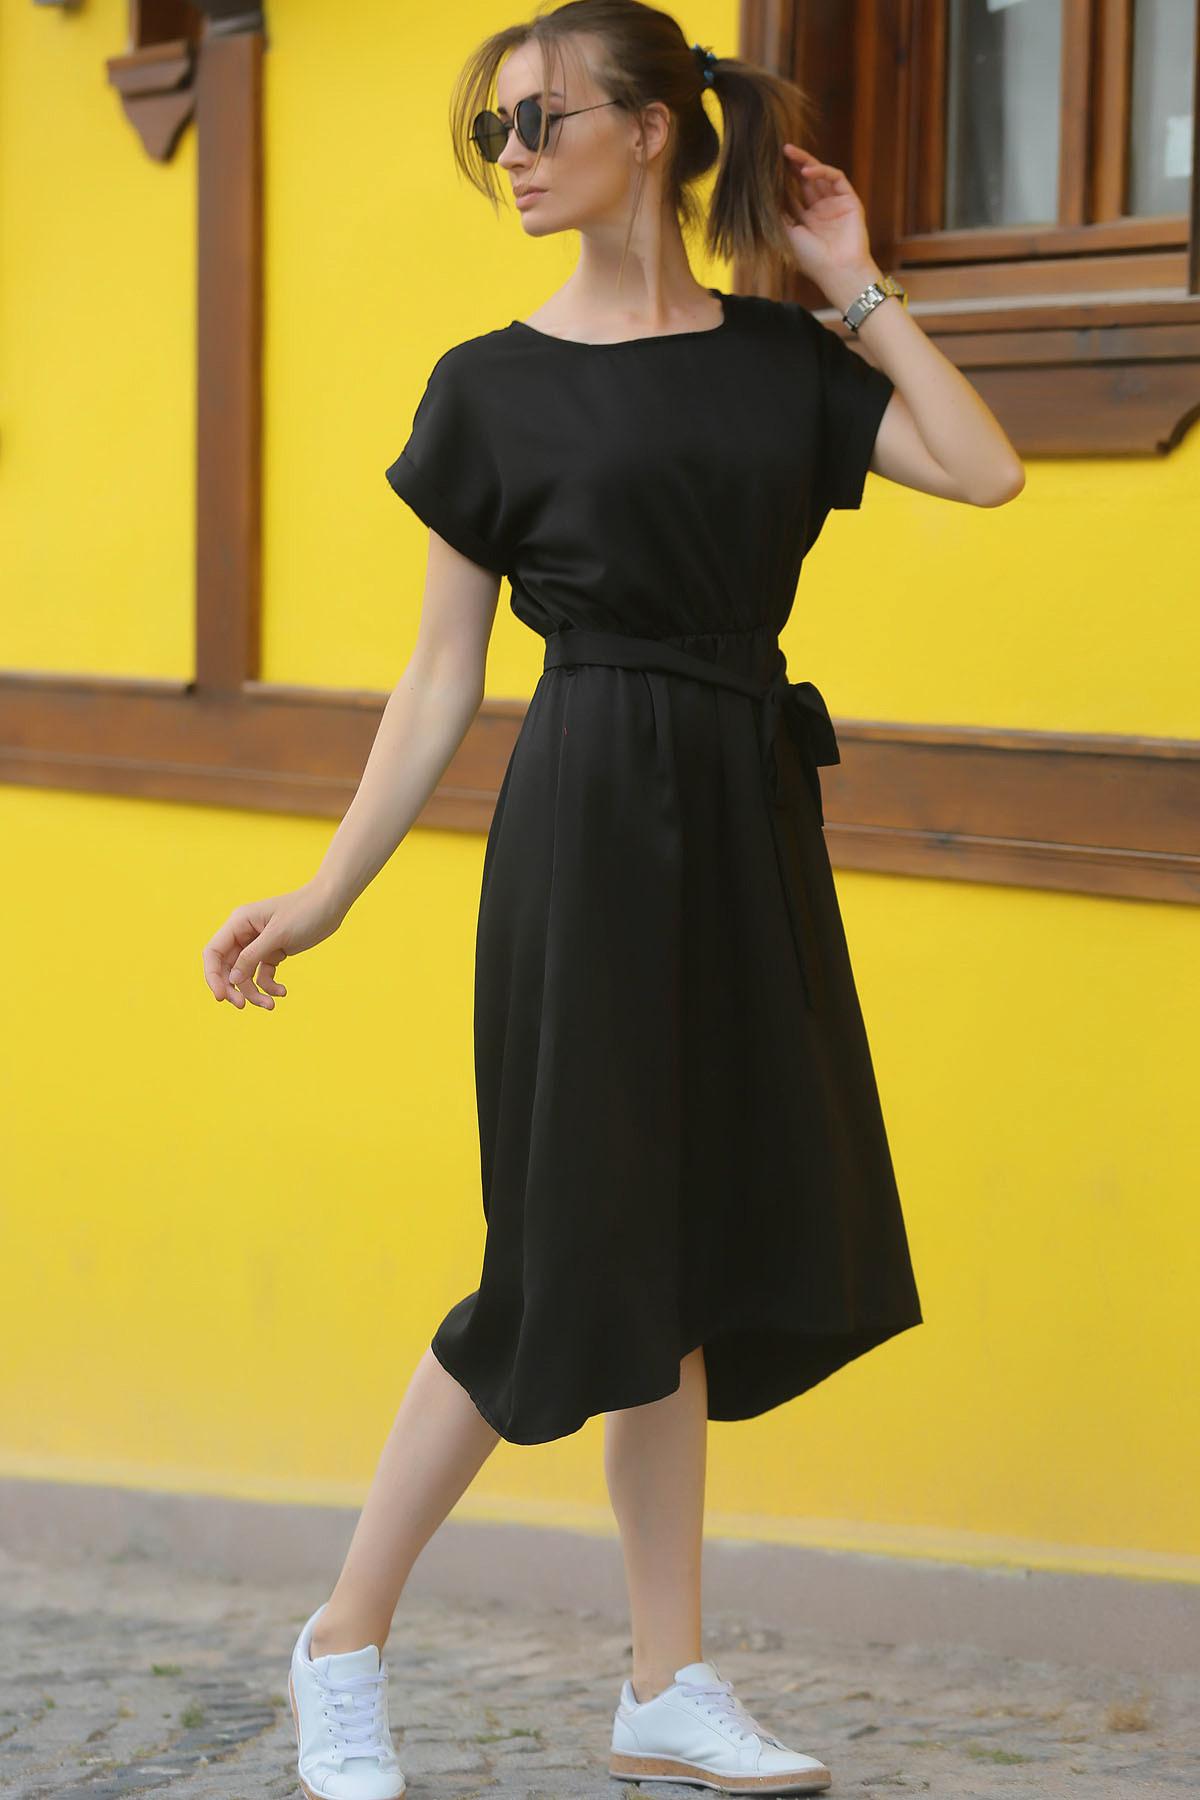 armonika Kadın Siyah Beli Lastikli Bağlamalı Elbise ARM-18Y001133 1